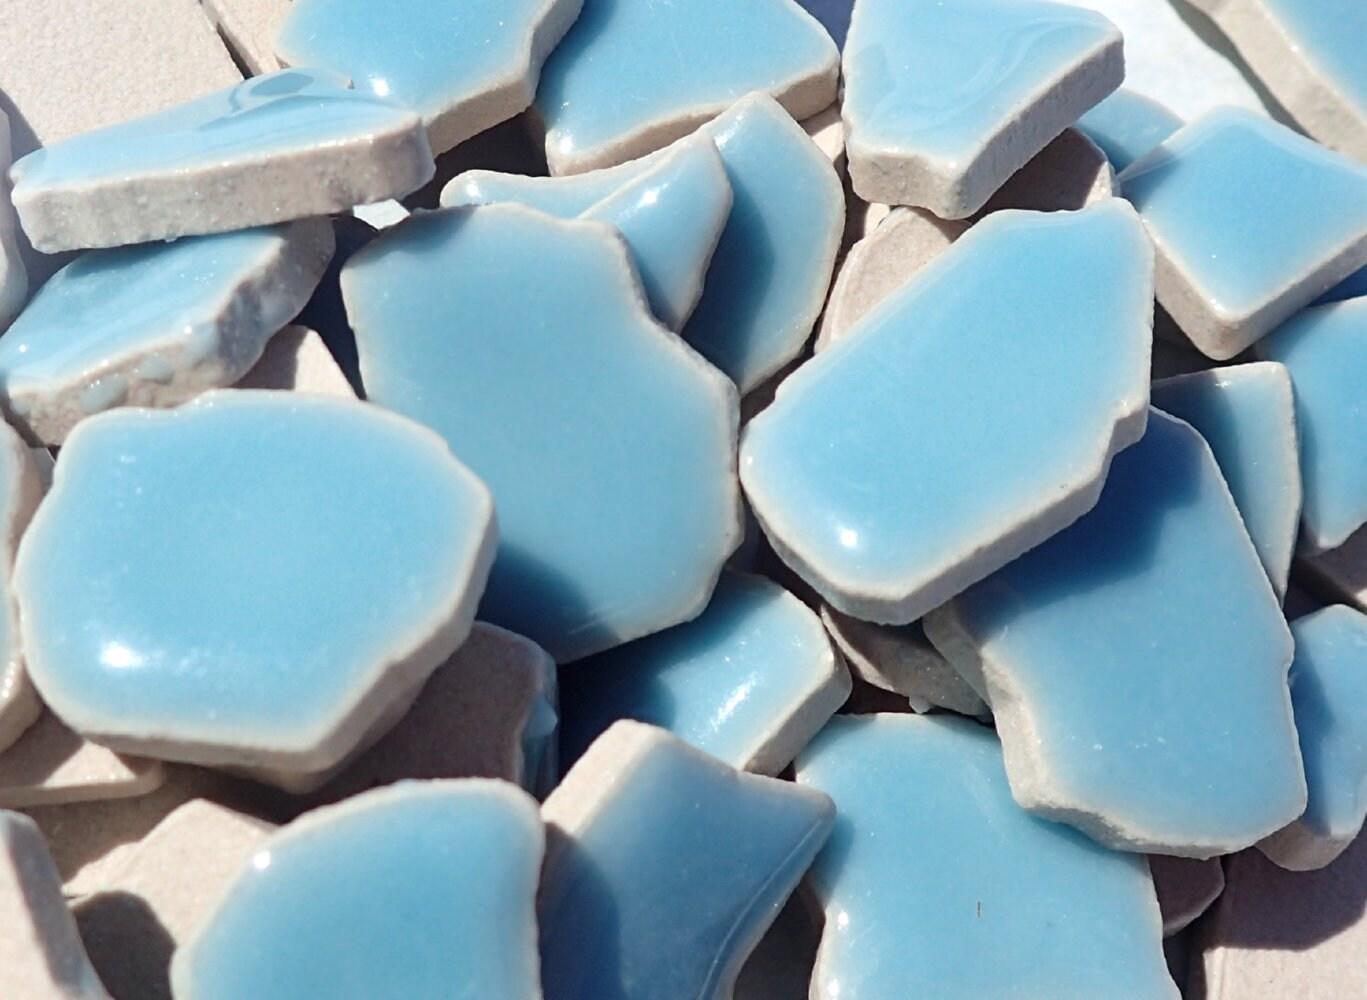 Light Blue Mosaic Ceramic Tiles - Jigsaw Puzzle Shaped Pieces - Half ...